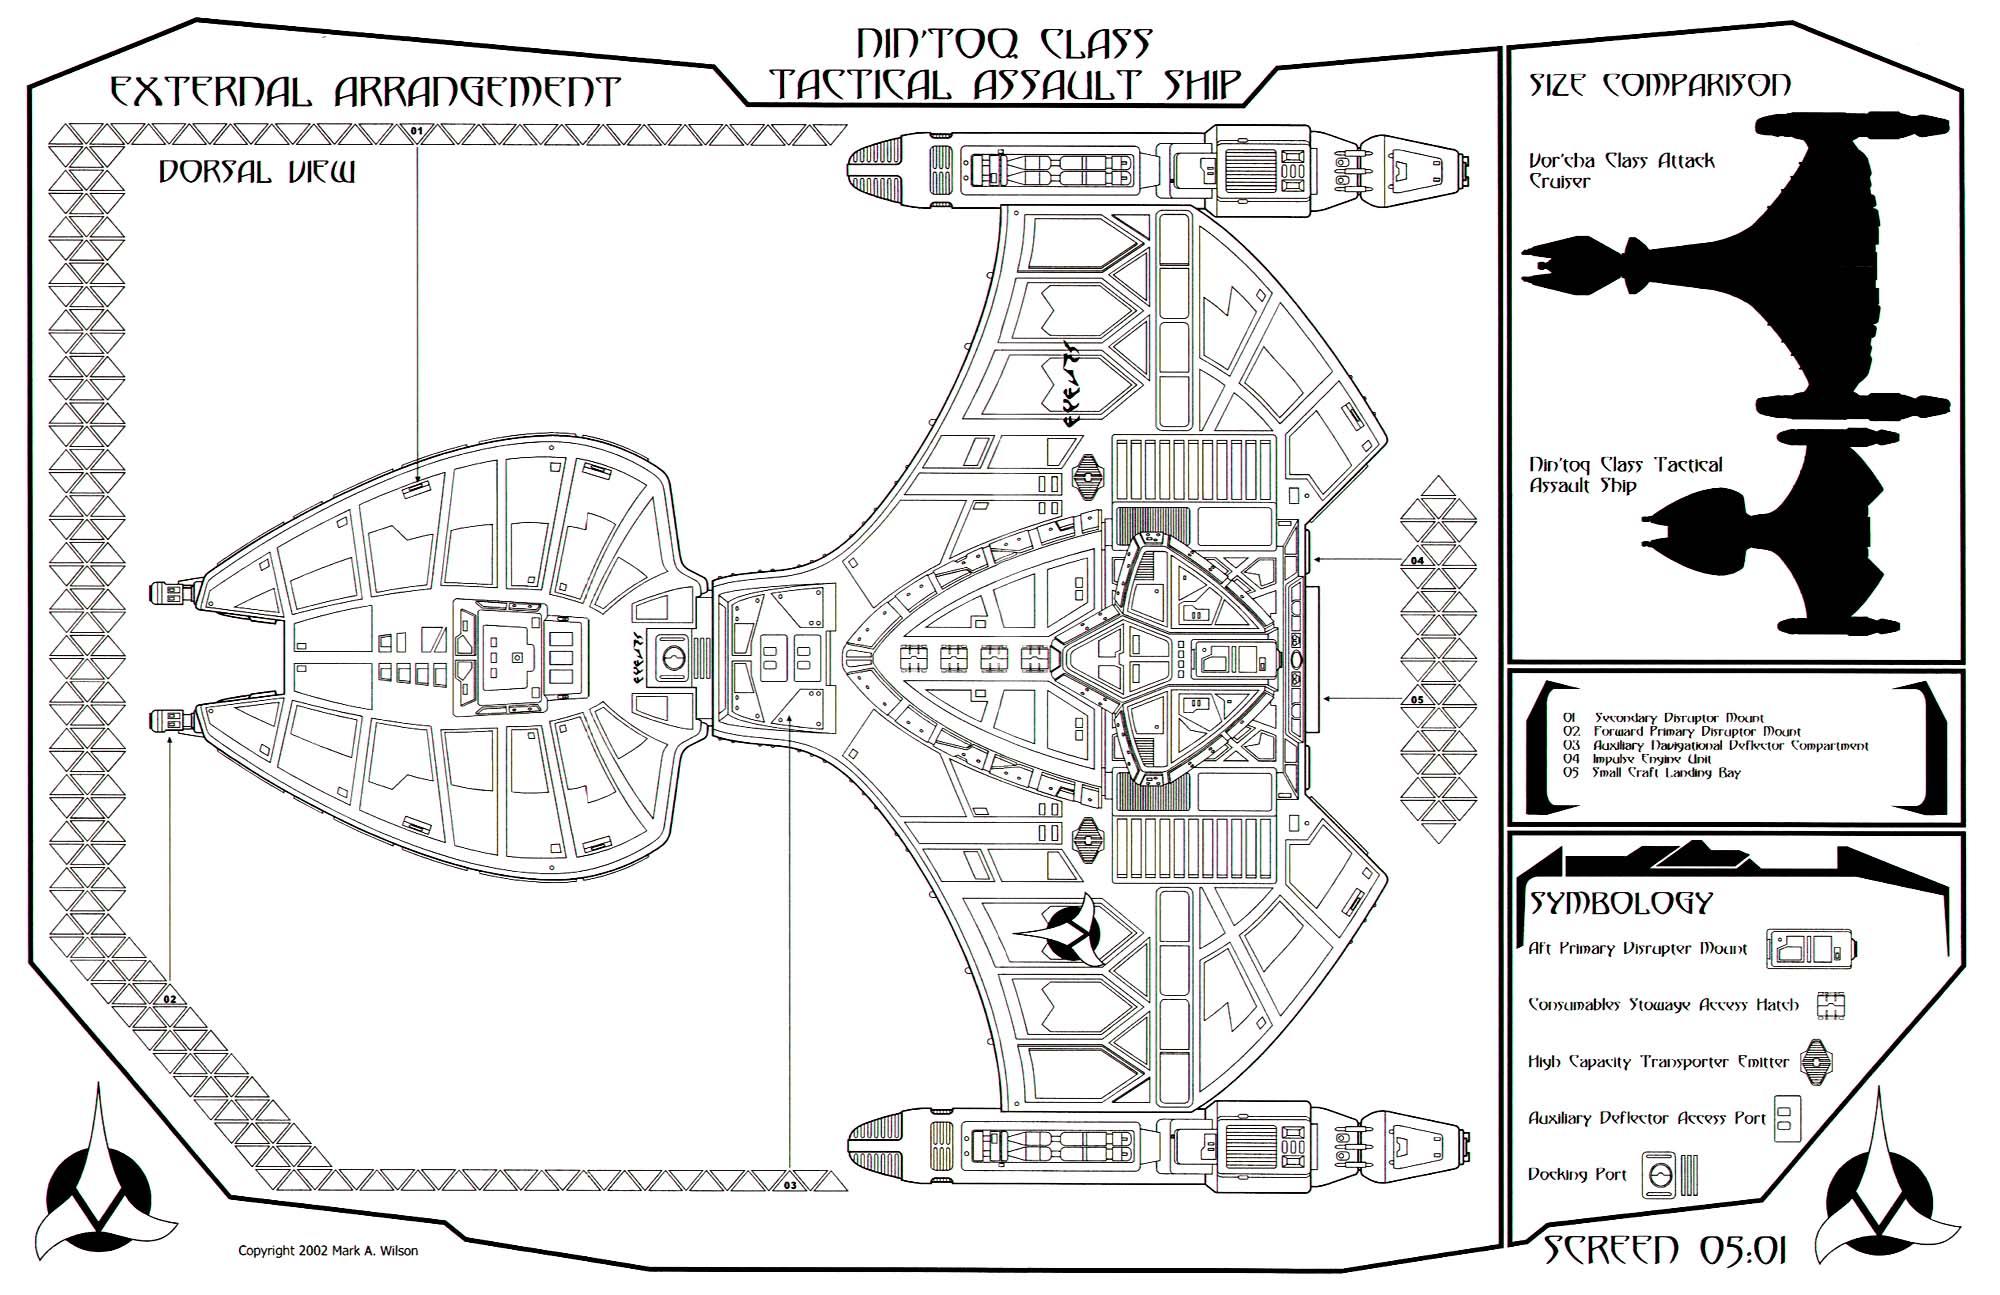 Star Trek Blueprints Klingon Nin Toq Class Tactical Assault Ship